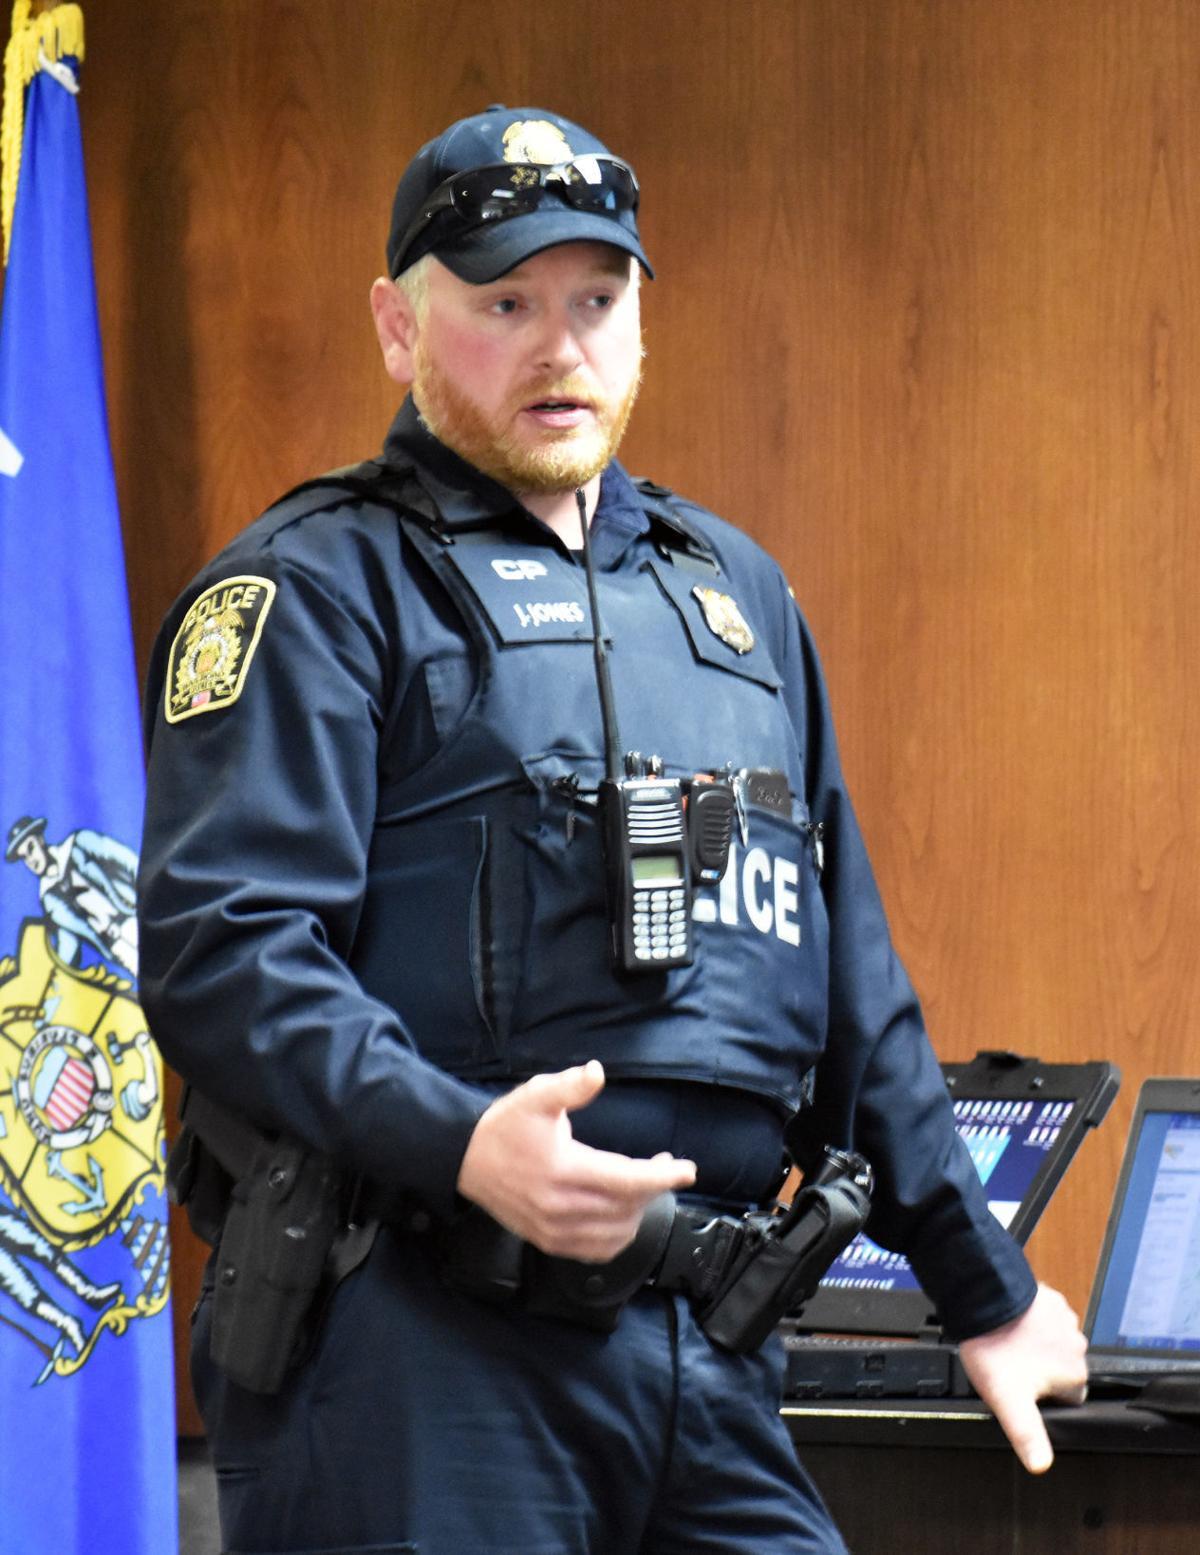 Jacob Jones from CP rail police